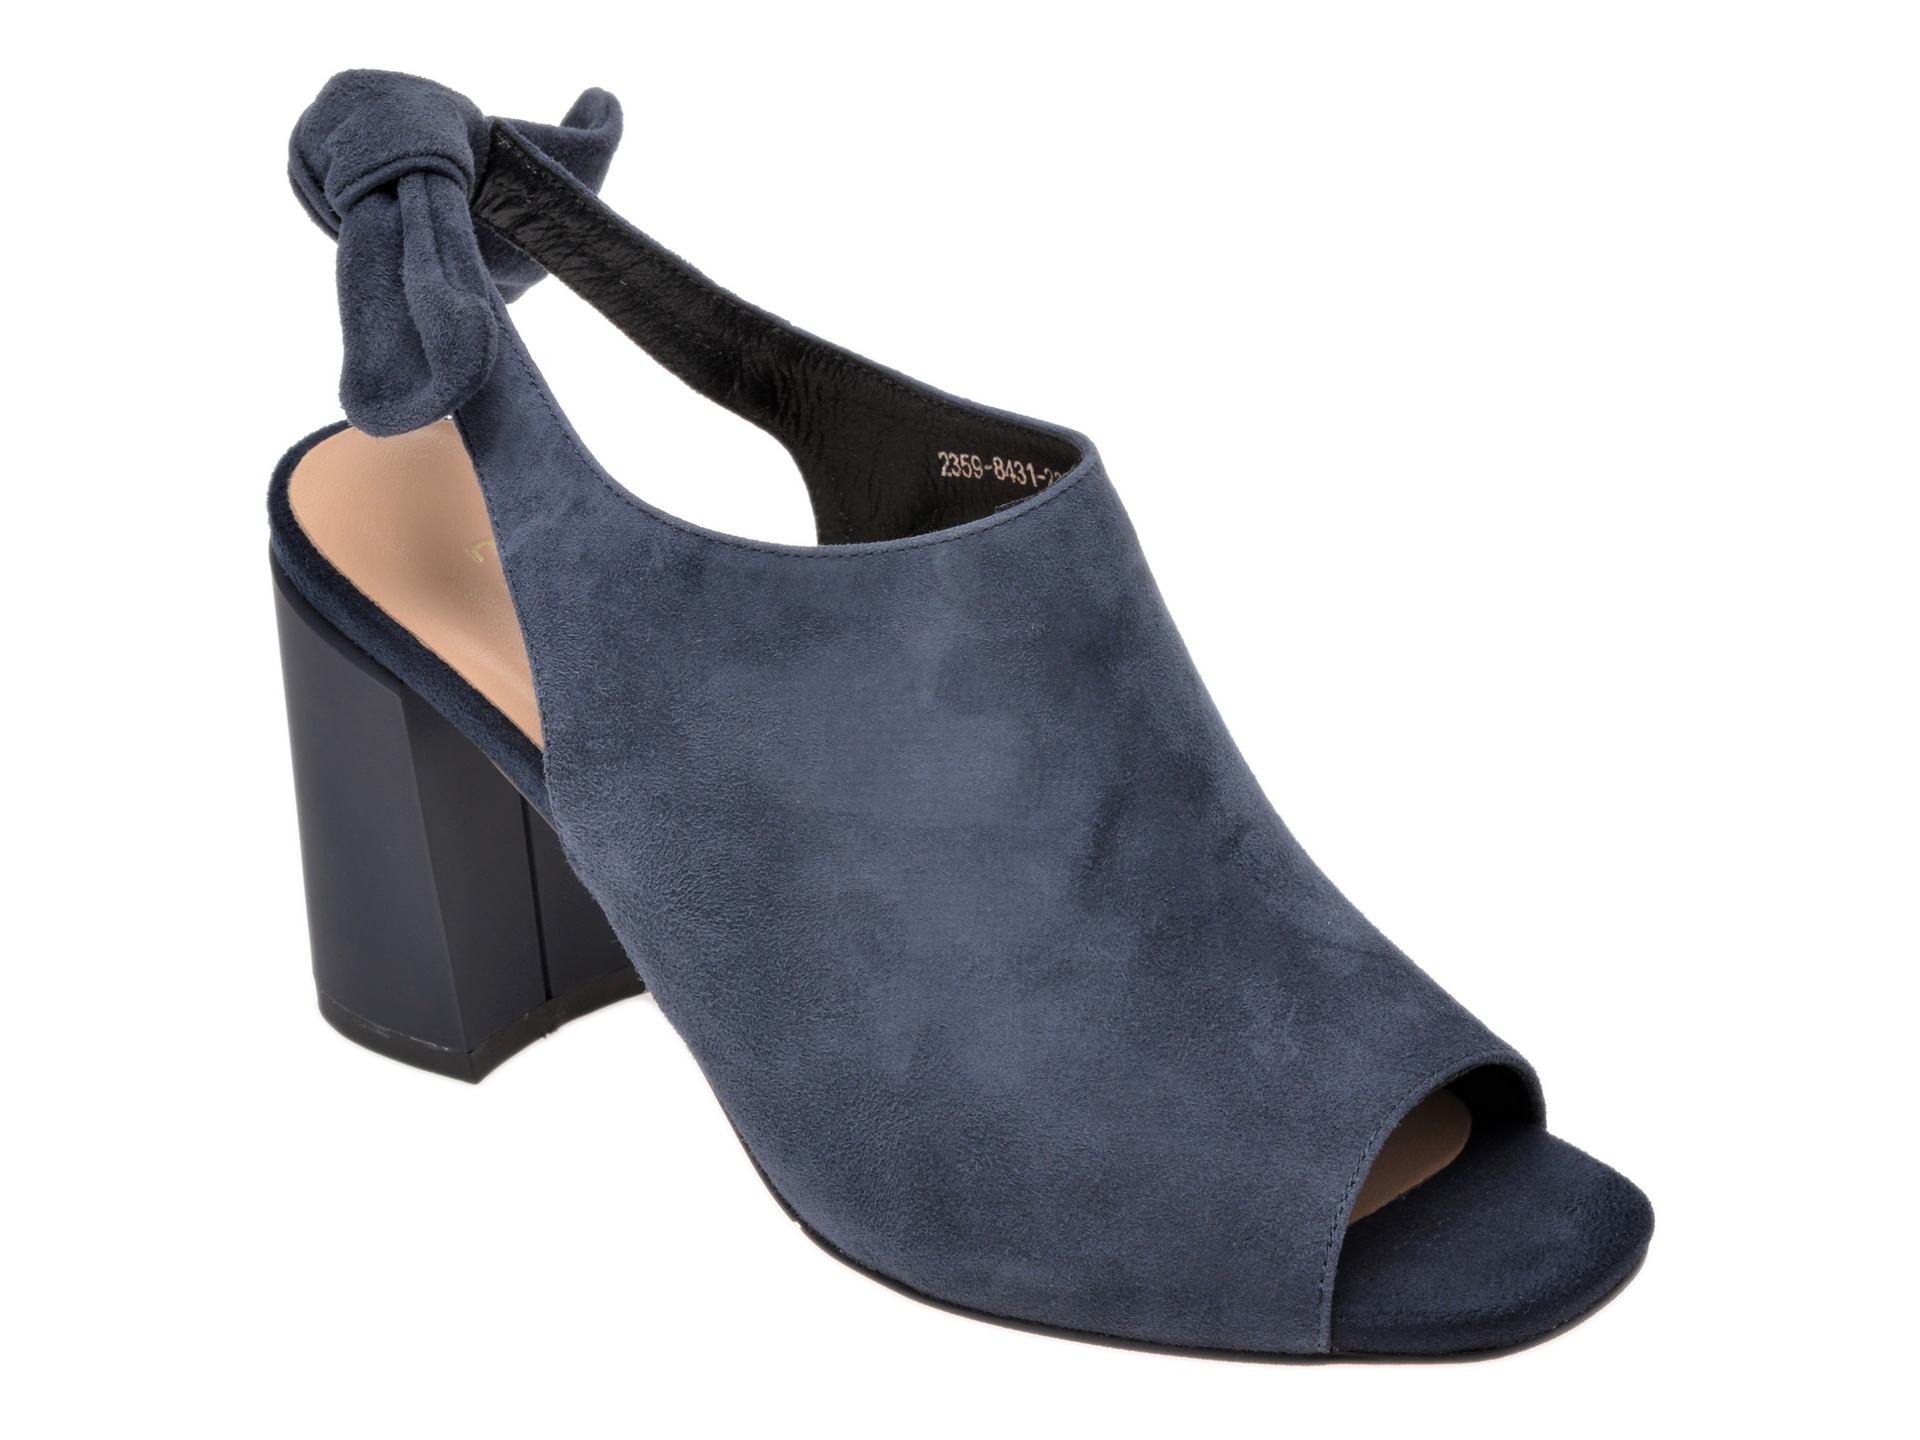 Sandale EPICA bleumarin, 2359843, din piele intoarsa